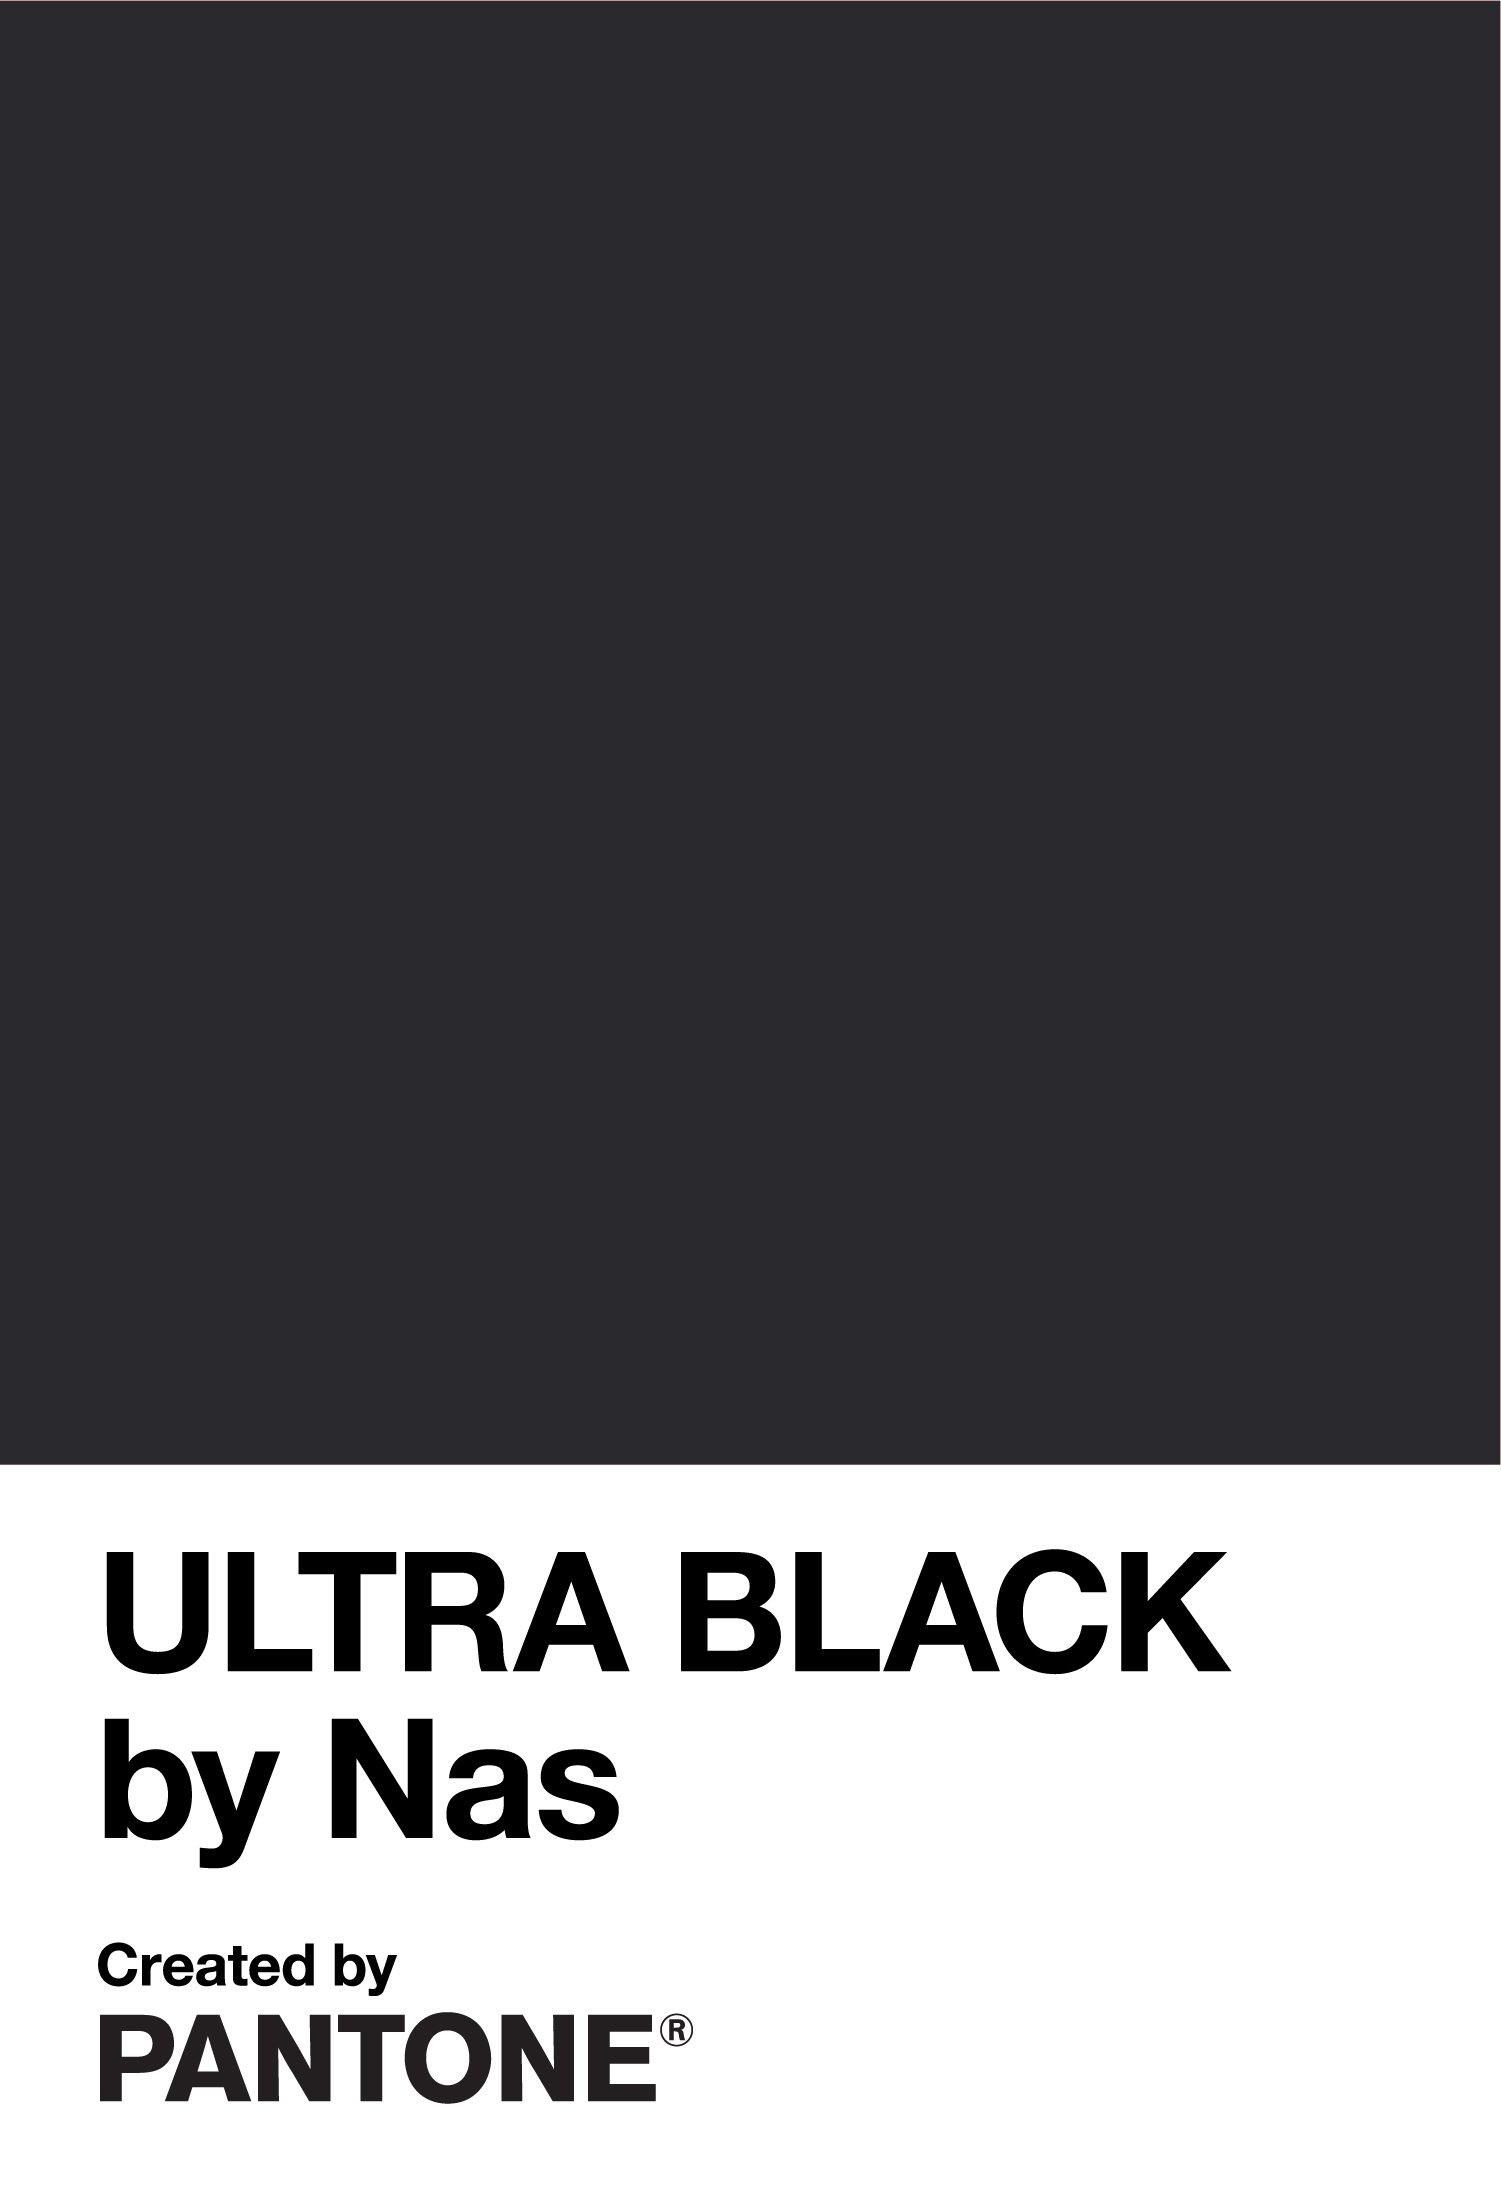 Thumbnail for Nas x Pantone collaboration